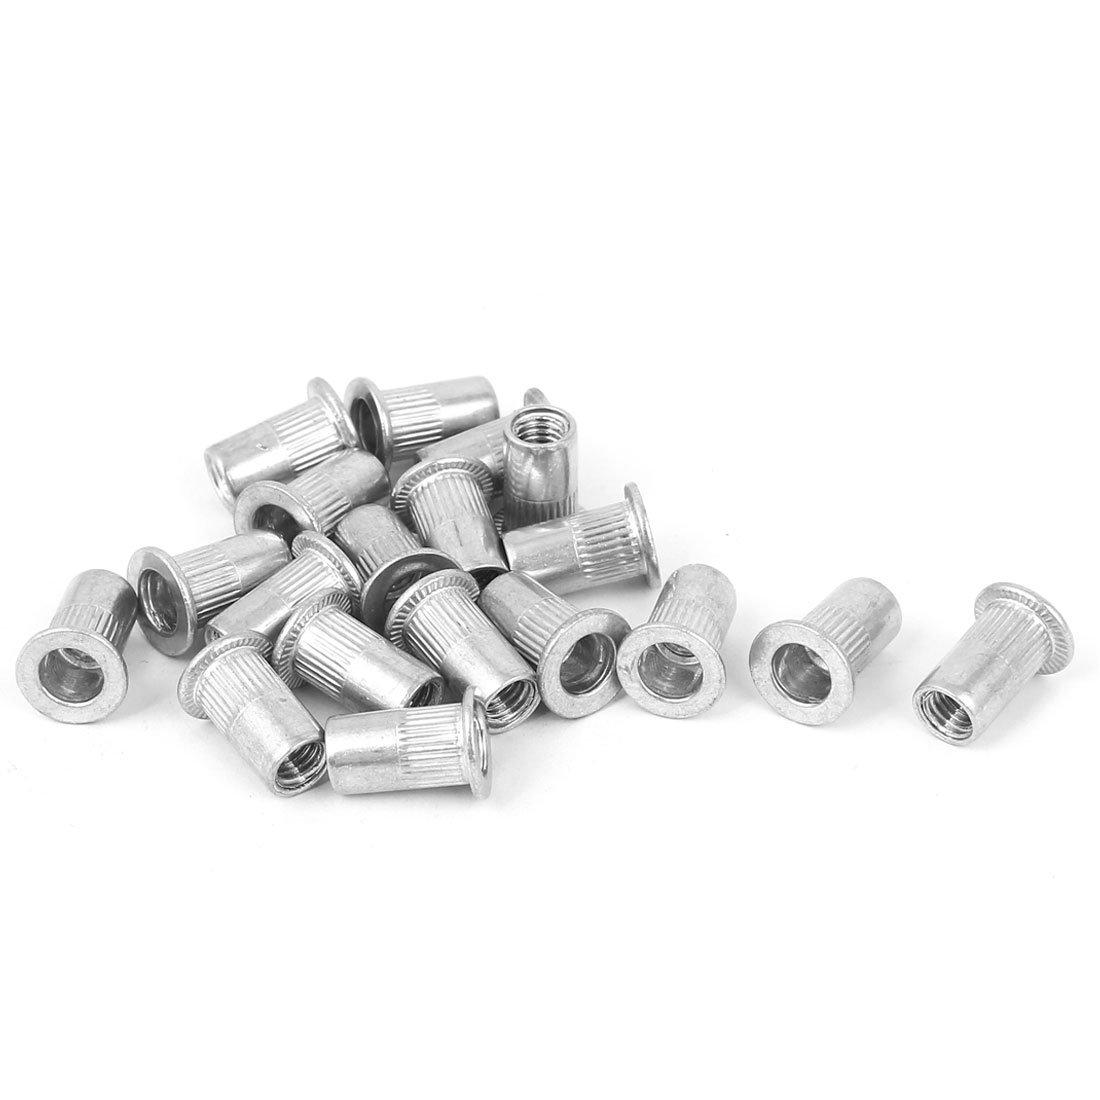 Uxcell a16041900ux0337 M5 Aluminum Flat Head Rivet Nut Insert Nutsert Silver Tone 20pcs Pack of 20